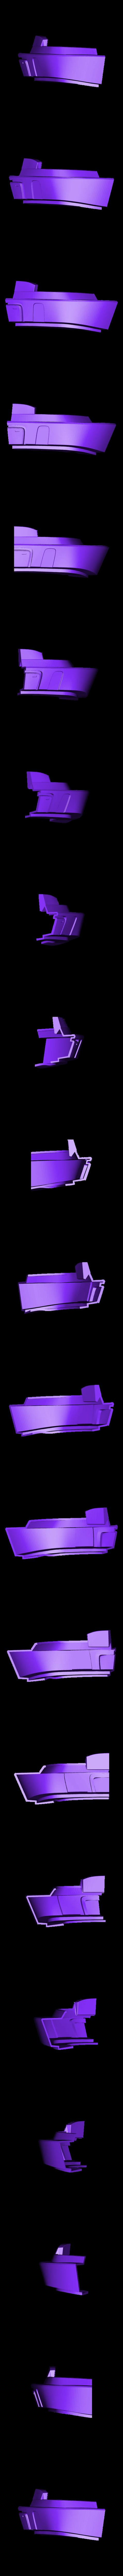 Part_20_v2.stl Download free STL file Battlestar Galactica Colonial Viper Pilot Helmet • 3D printing object, VillainousPropShop